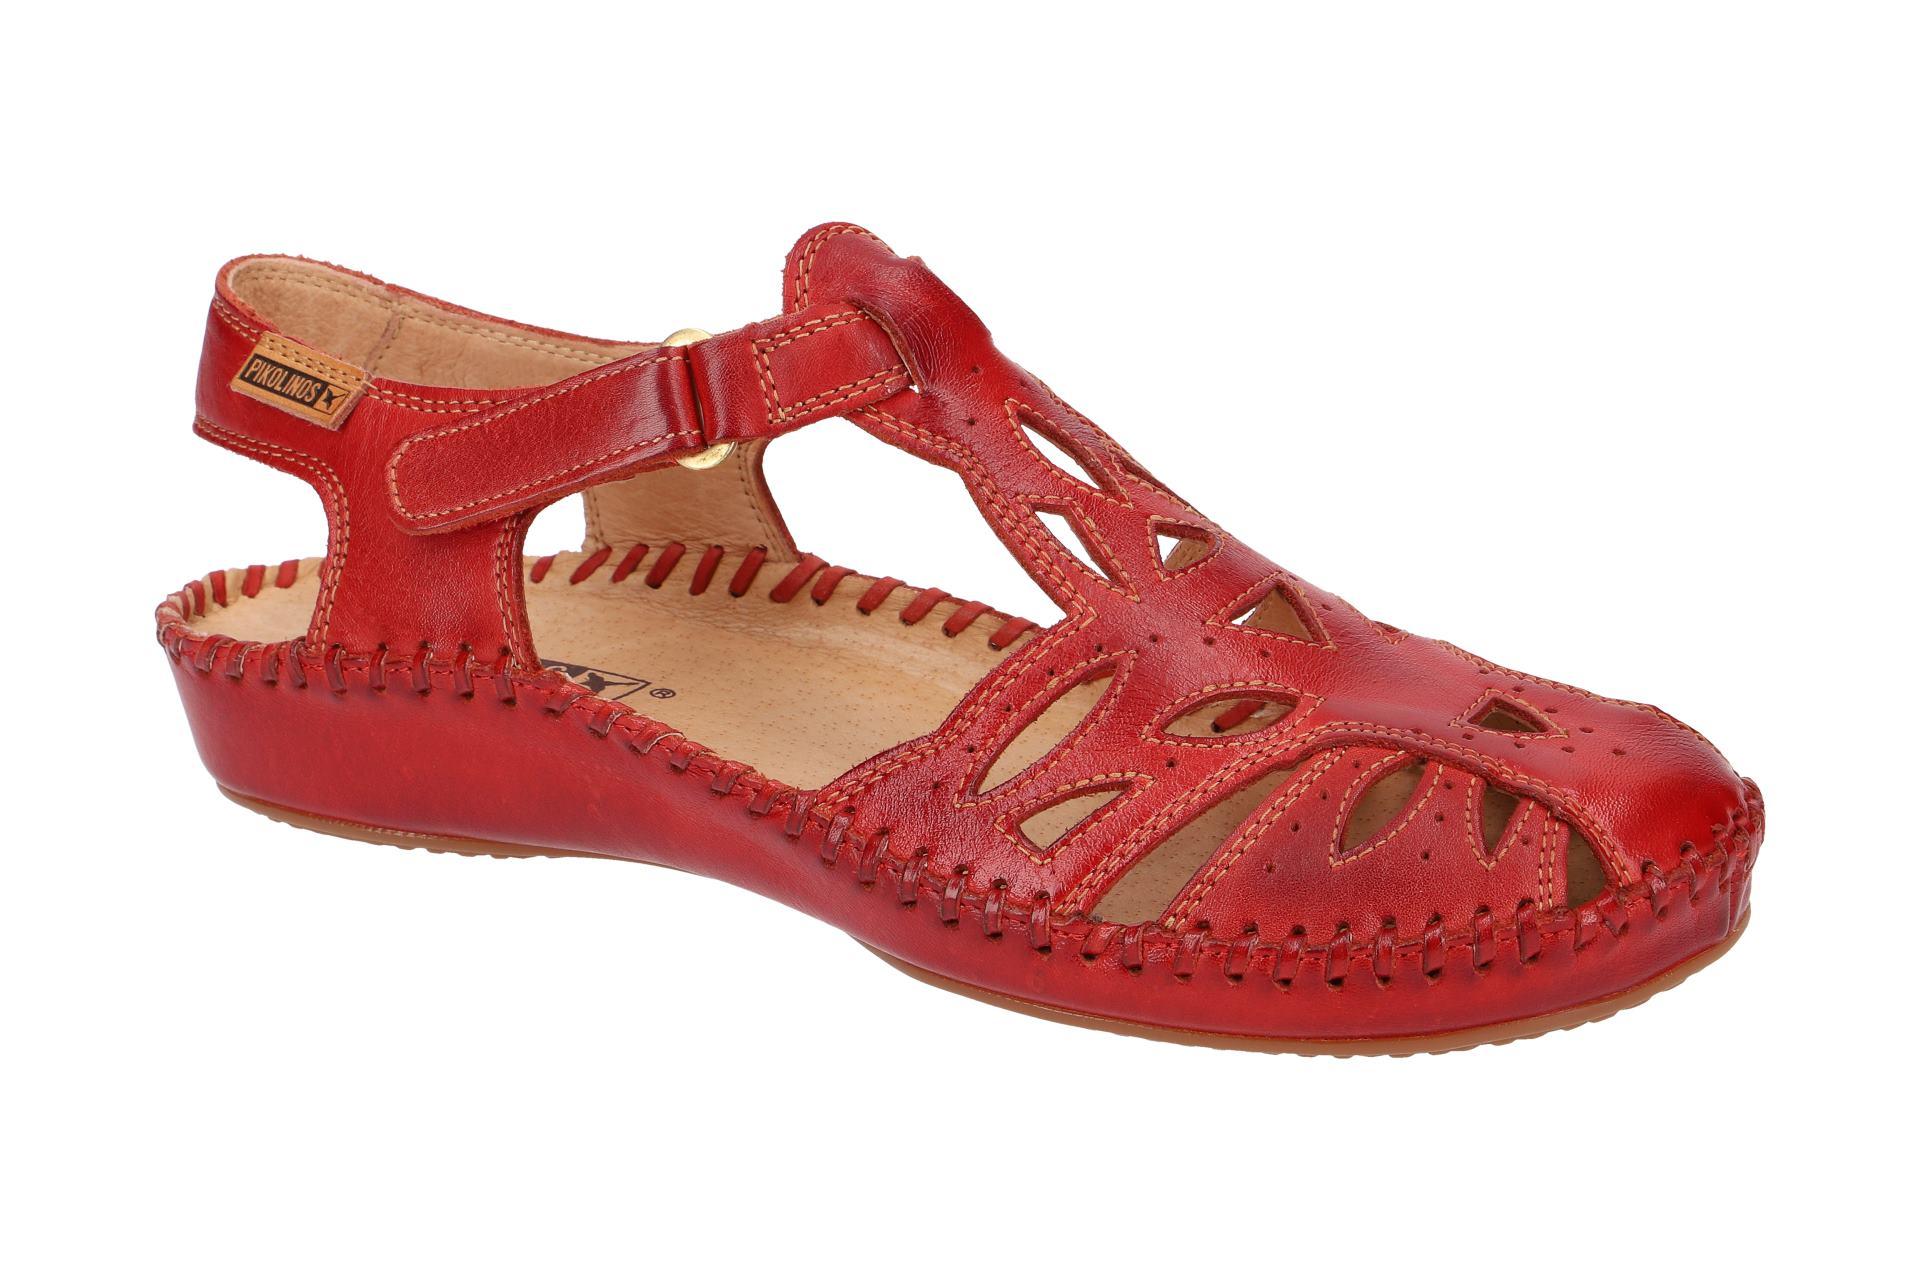 Pikolinos Schuhe P. VALLARTA rot Damen Sandale Sandaletten 655 8312 coral NEU